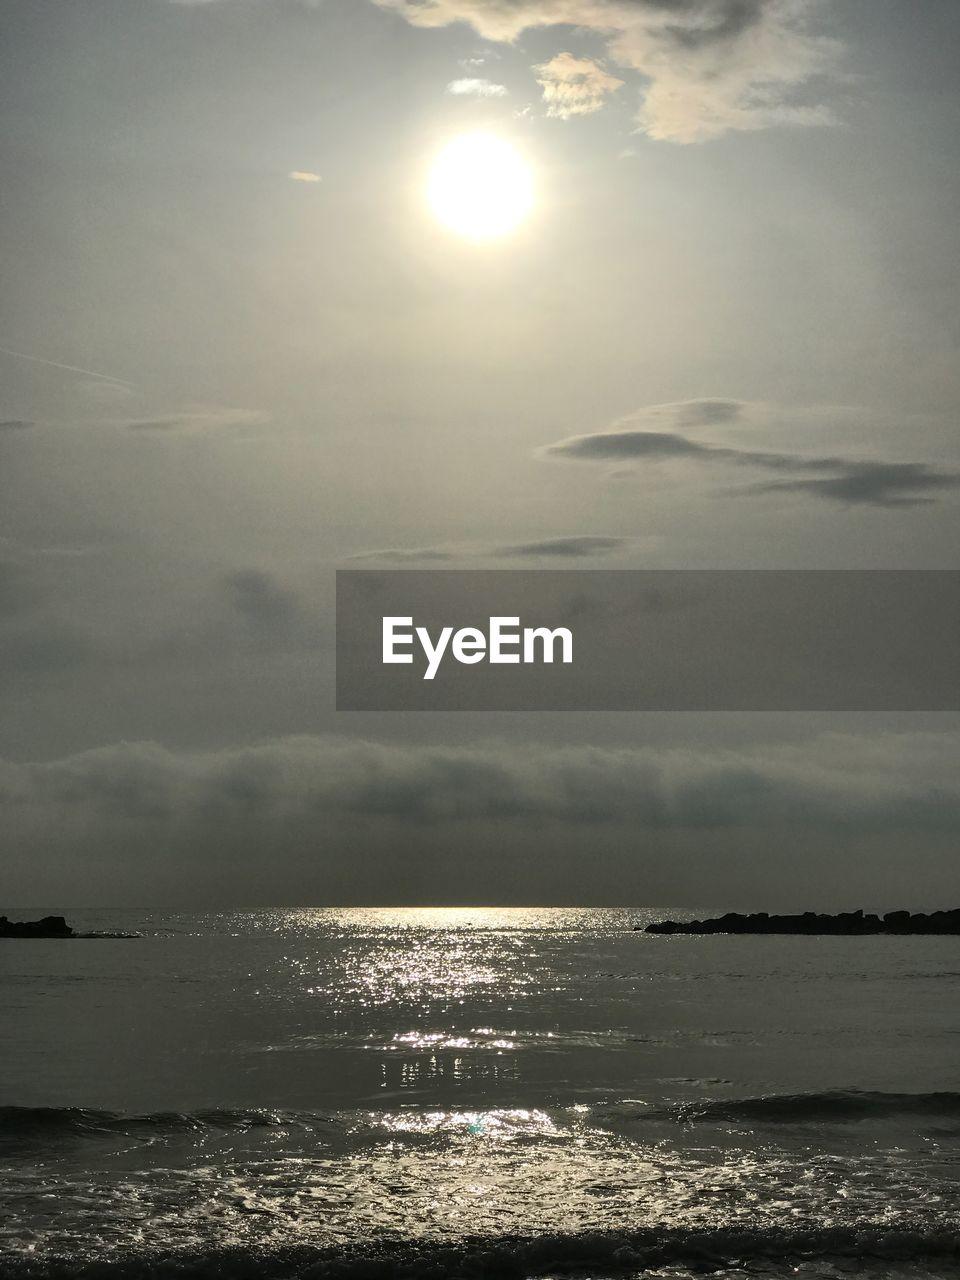 sky, sea, water, scenics - nature, beauty in nature, horizon over water, horizon, cloud - sky, tranquility, sunlight, tranquil scene, nature, sun, land, beach, idyllic, no people, outdoors, reflection, moonlight